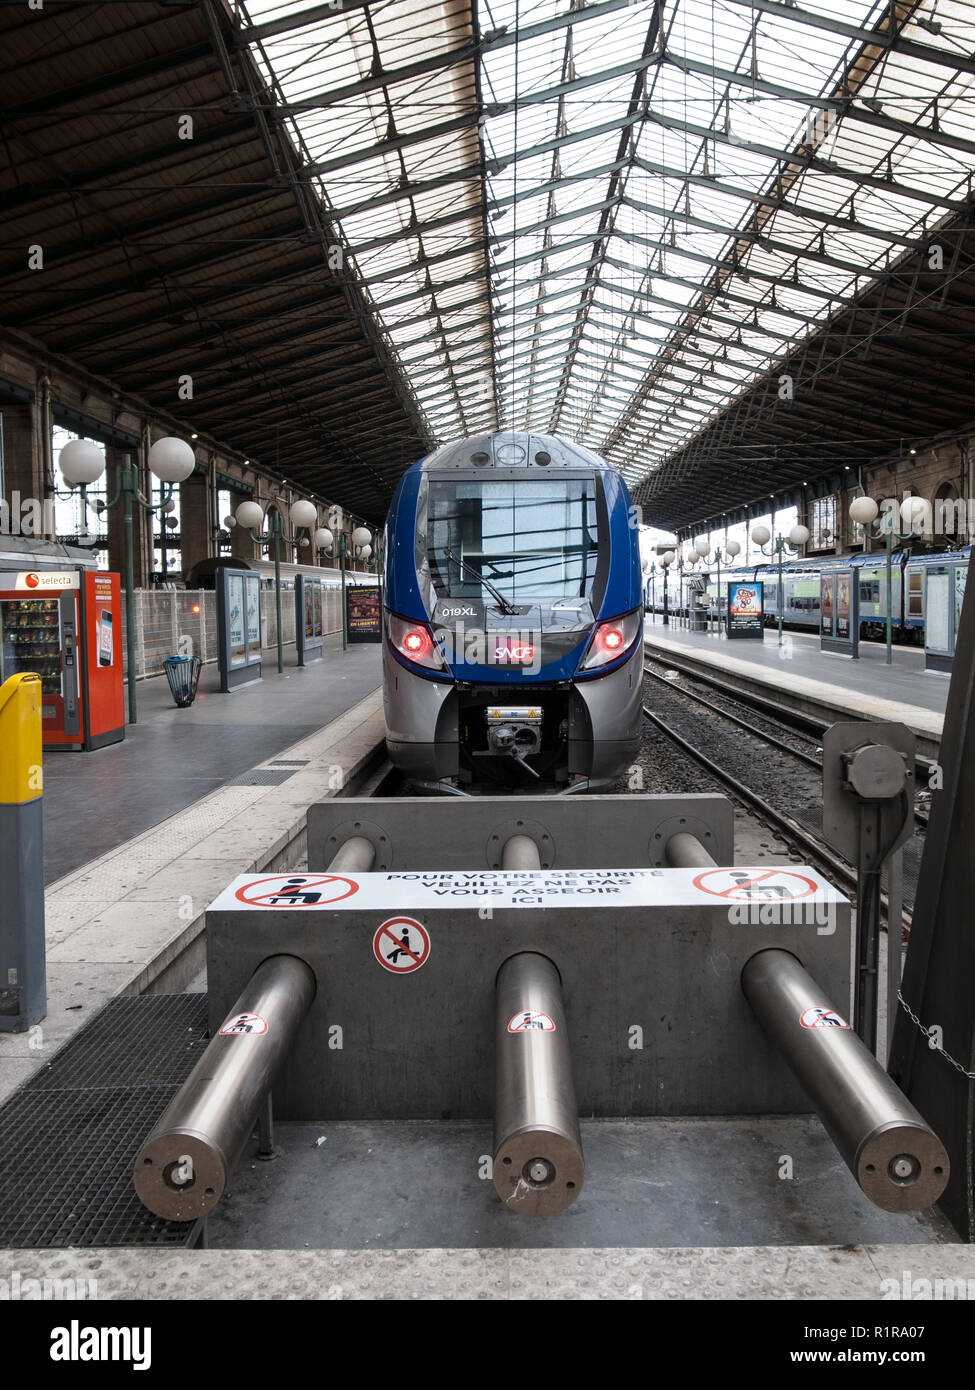 FRENCH RAILWAY - PARIS TRAIN STATION - FRENCH TRAIN - EUROSTAR - PARIS GARE DU NORD - TALIS TRAIN - TRAINS IN GARE DU NORD PARIS -© F.BEAUMONT - Stock Image